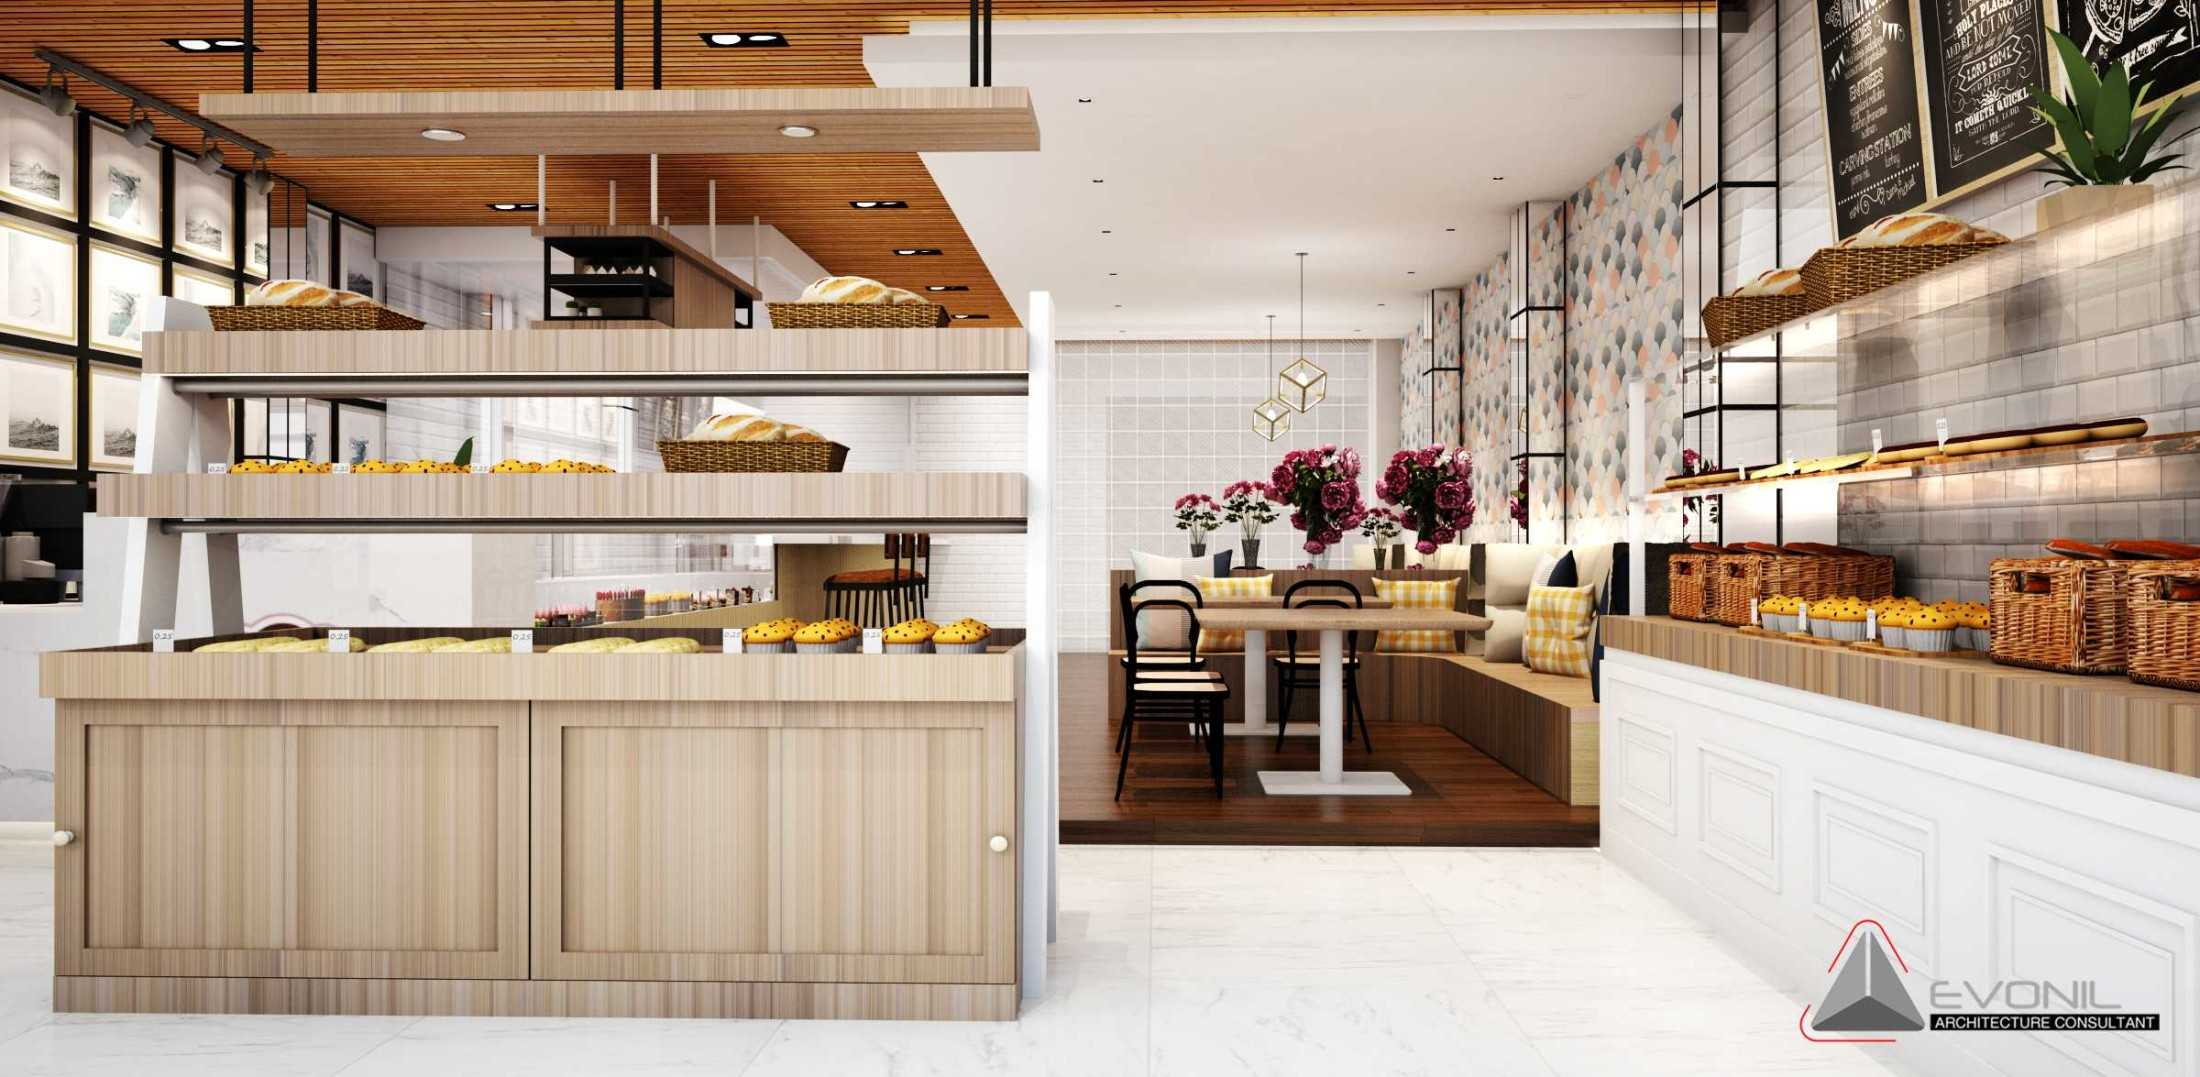 Evonil Architecture Joyful Bakery - Makassar Makassar, Kota Makassar, Sulawesi Selatan, Indonesia Makassar, Kota Makassar, Sulawesi Selatan, Indonesia Evonil-Architecture-Joyful-Bakery-Makassar  77970